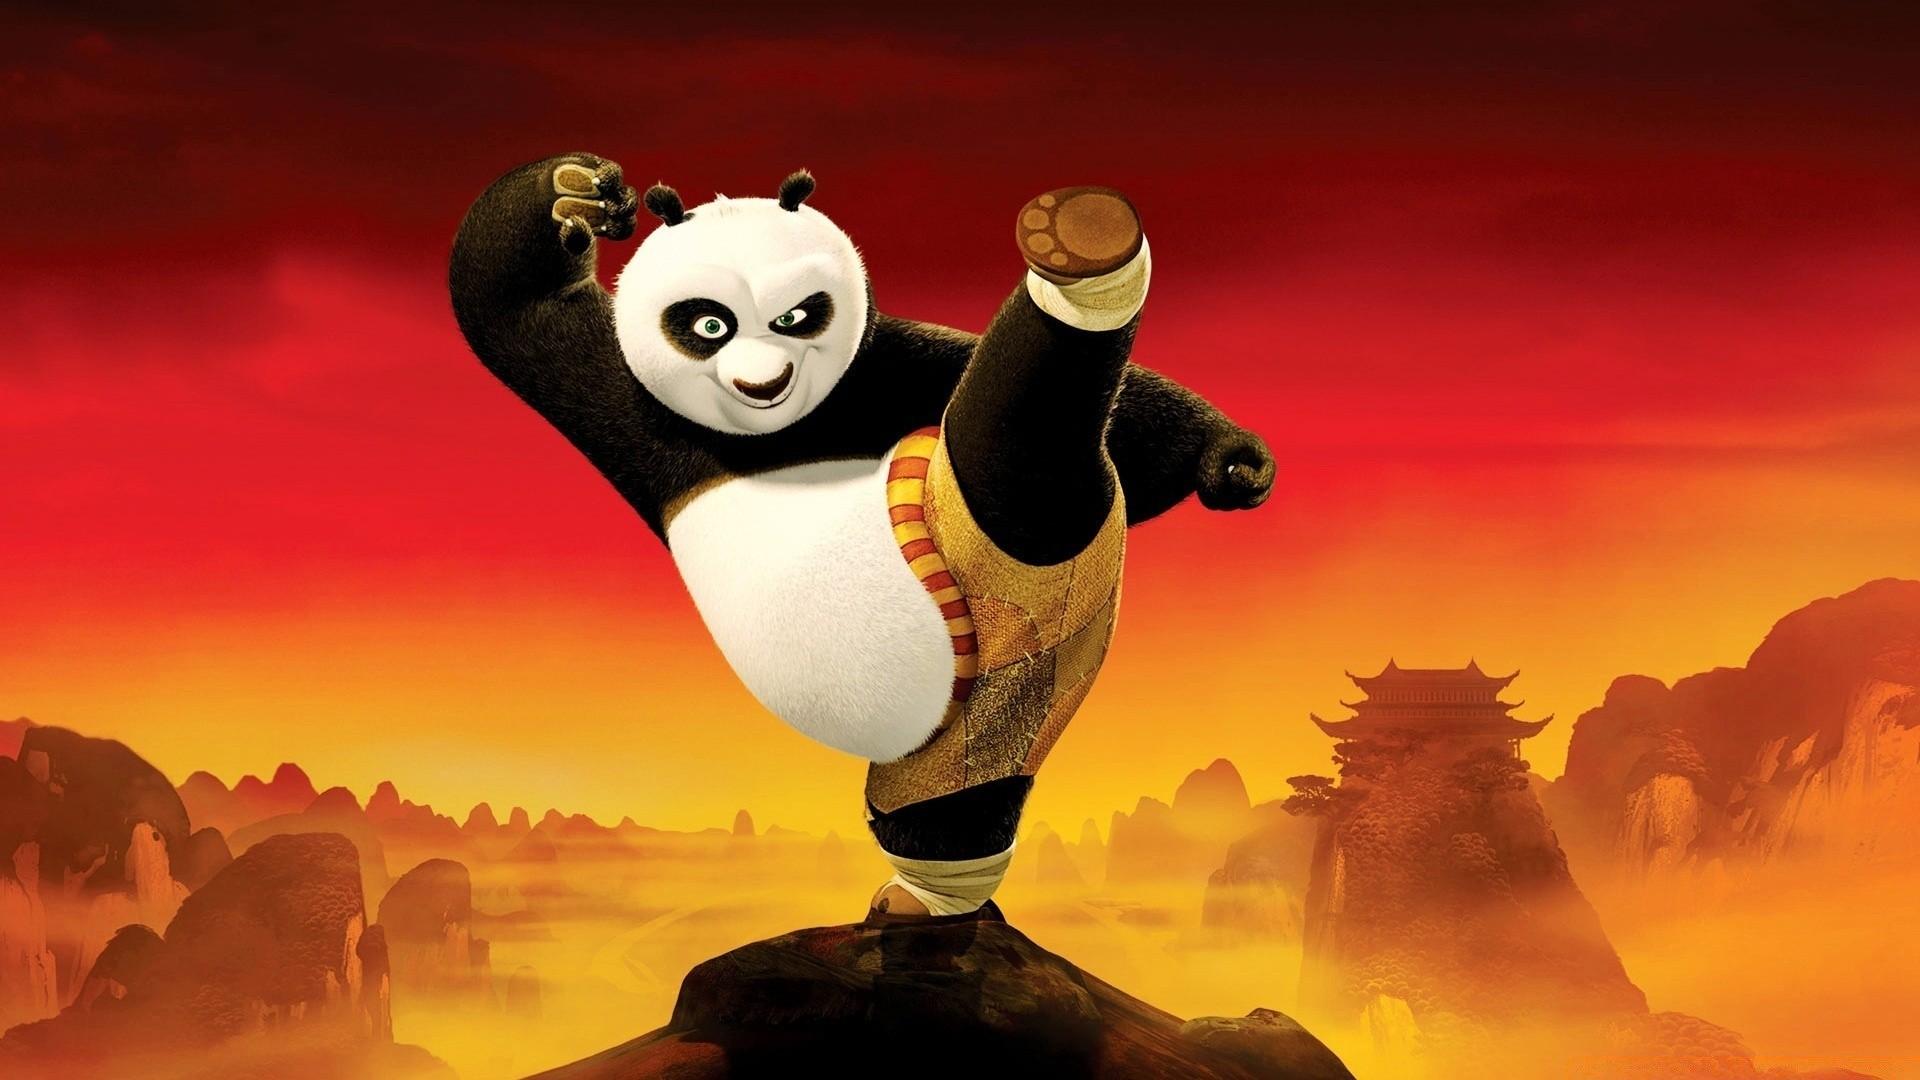 Kung Fu Panda full wallpaper